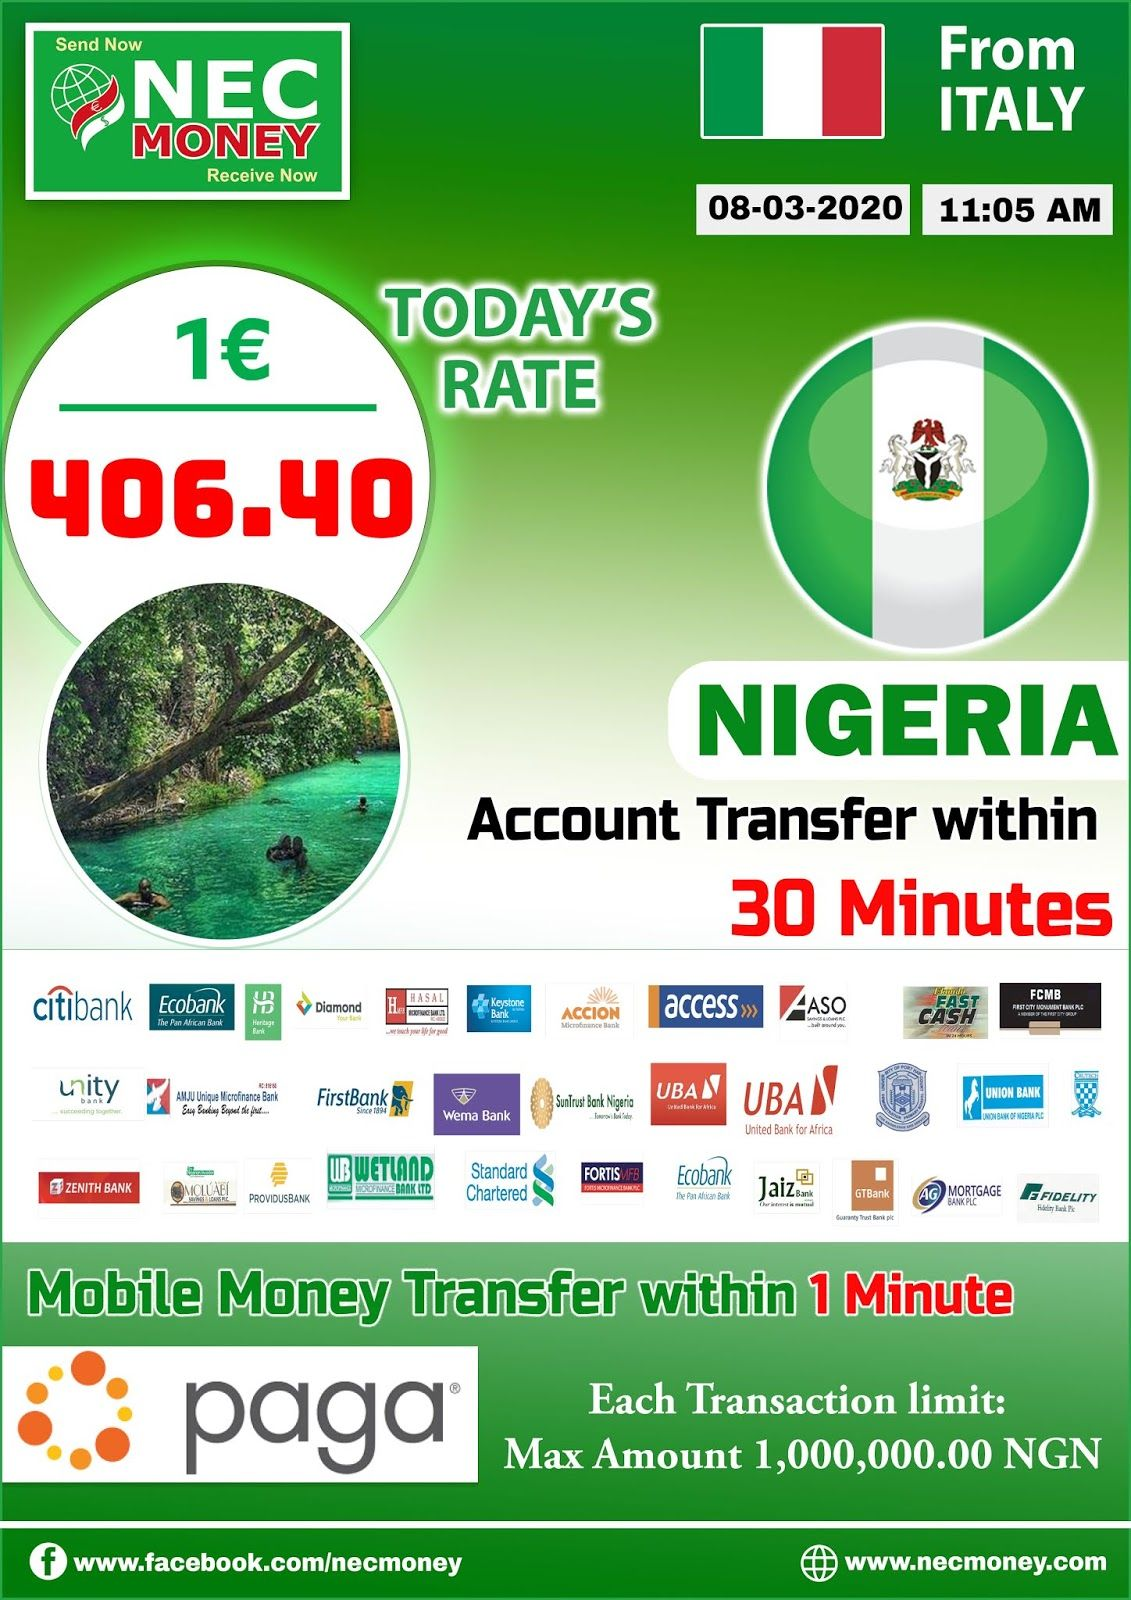 Ignition Money Transfer